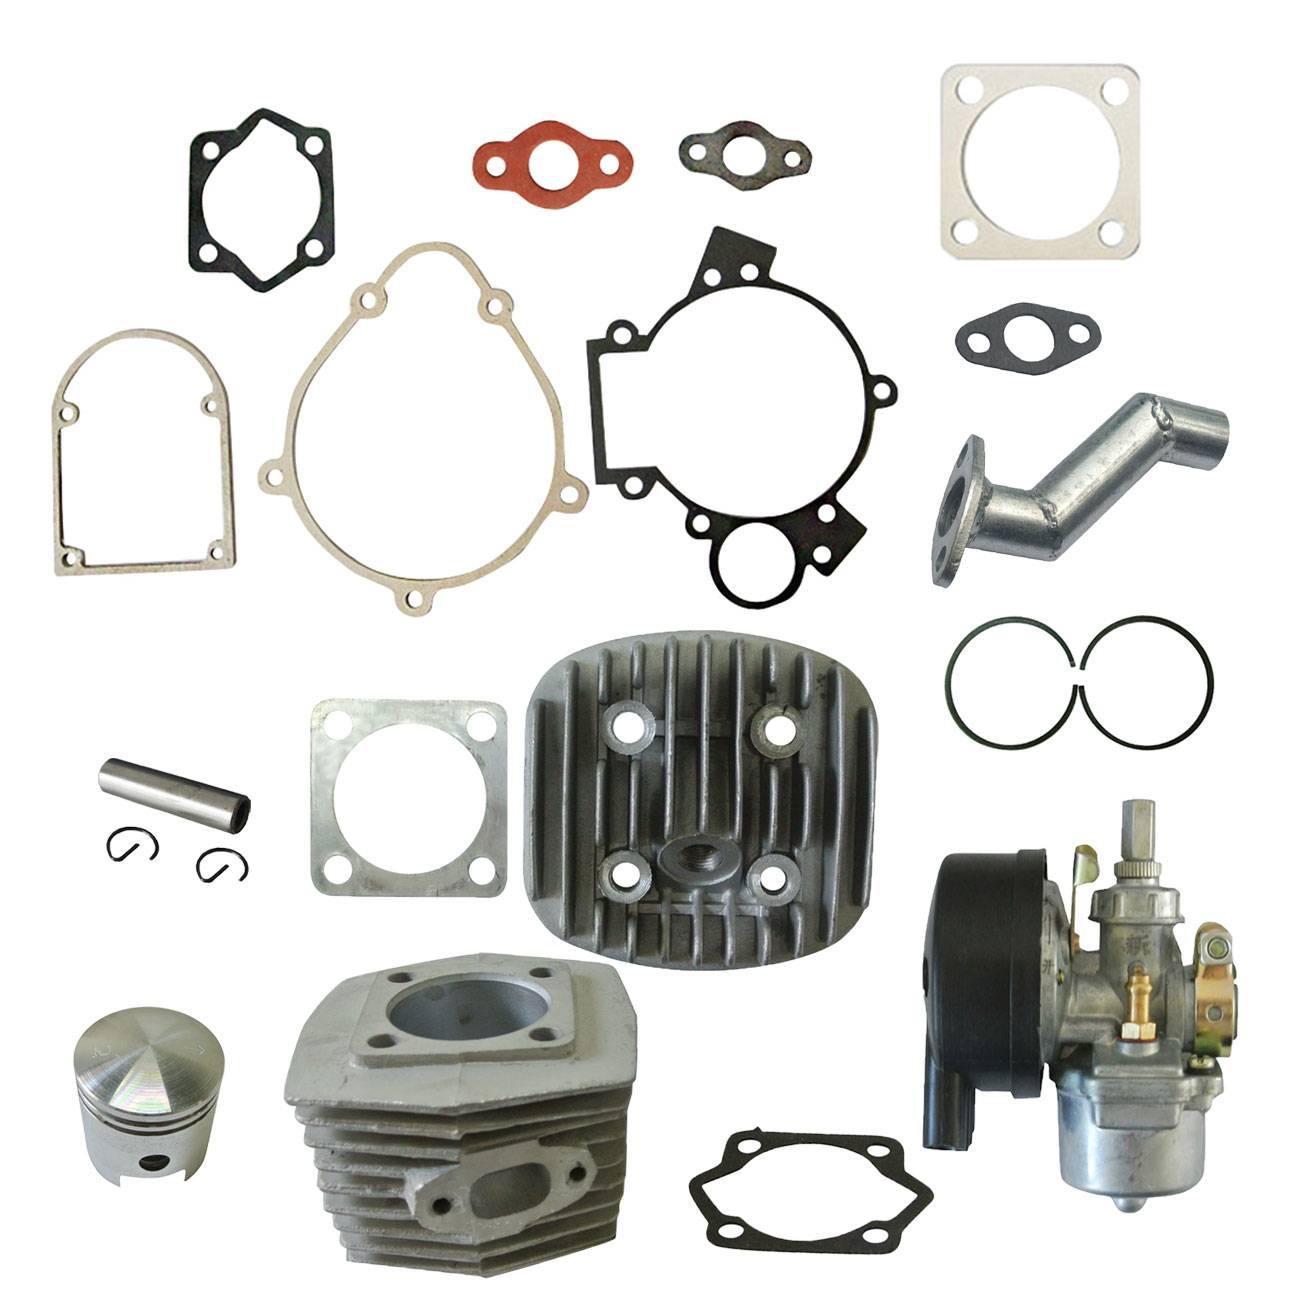 Cylinder Head&1xGasket Kit&Carburetor Fits 66/80cc 2 Stroke Engine Motorized Bicycle